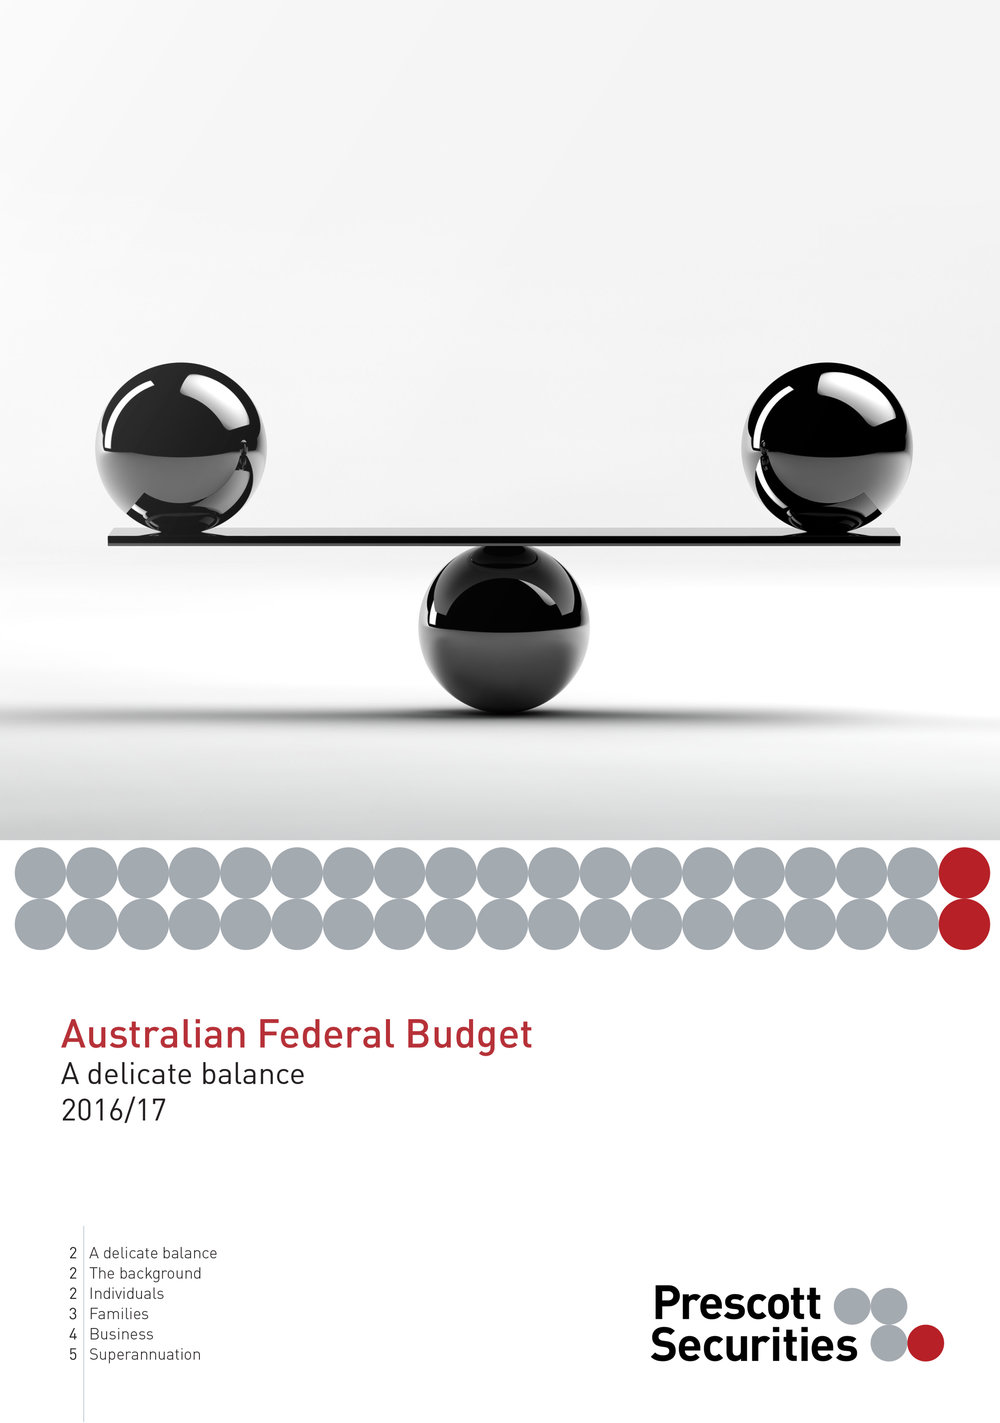 Prescott-Federal-Budget.jpg